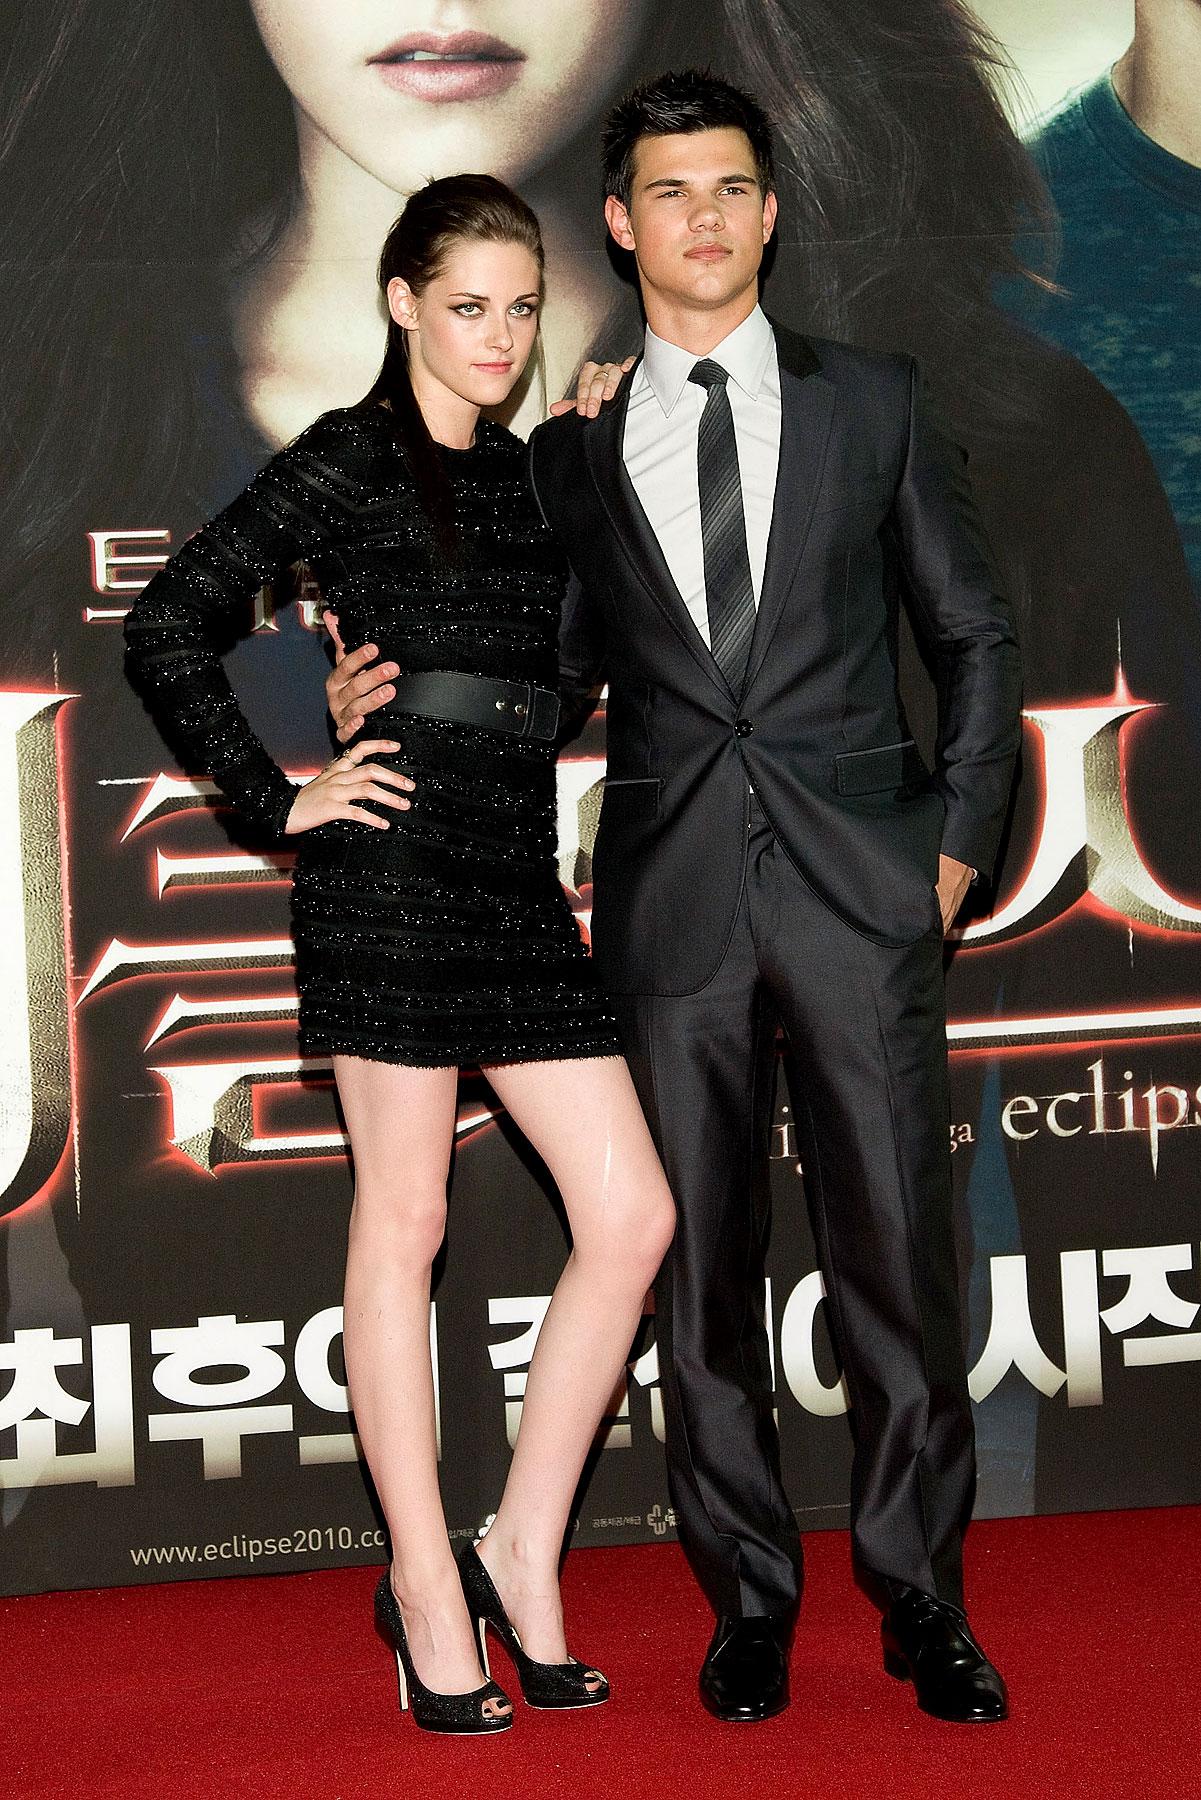 Kristen Stewart and Taylor Lautner Take the 'Eclipse' Promo Juggernaut to South Korea (PHOTOS)